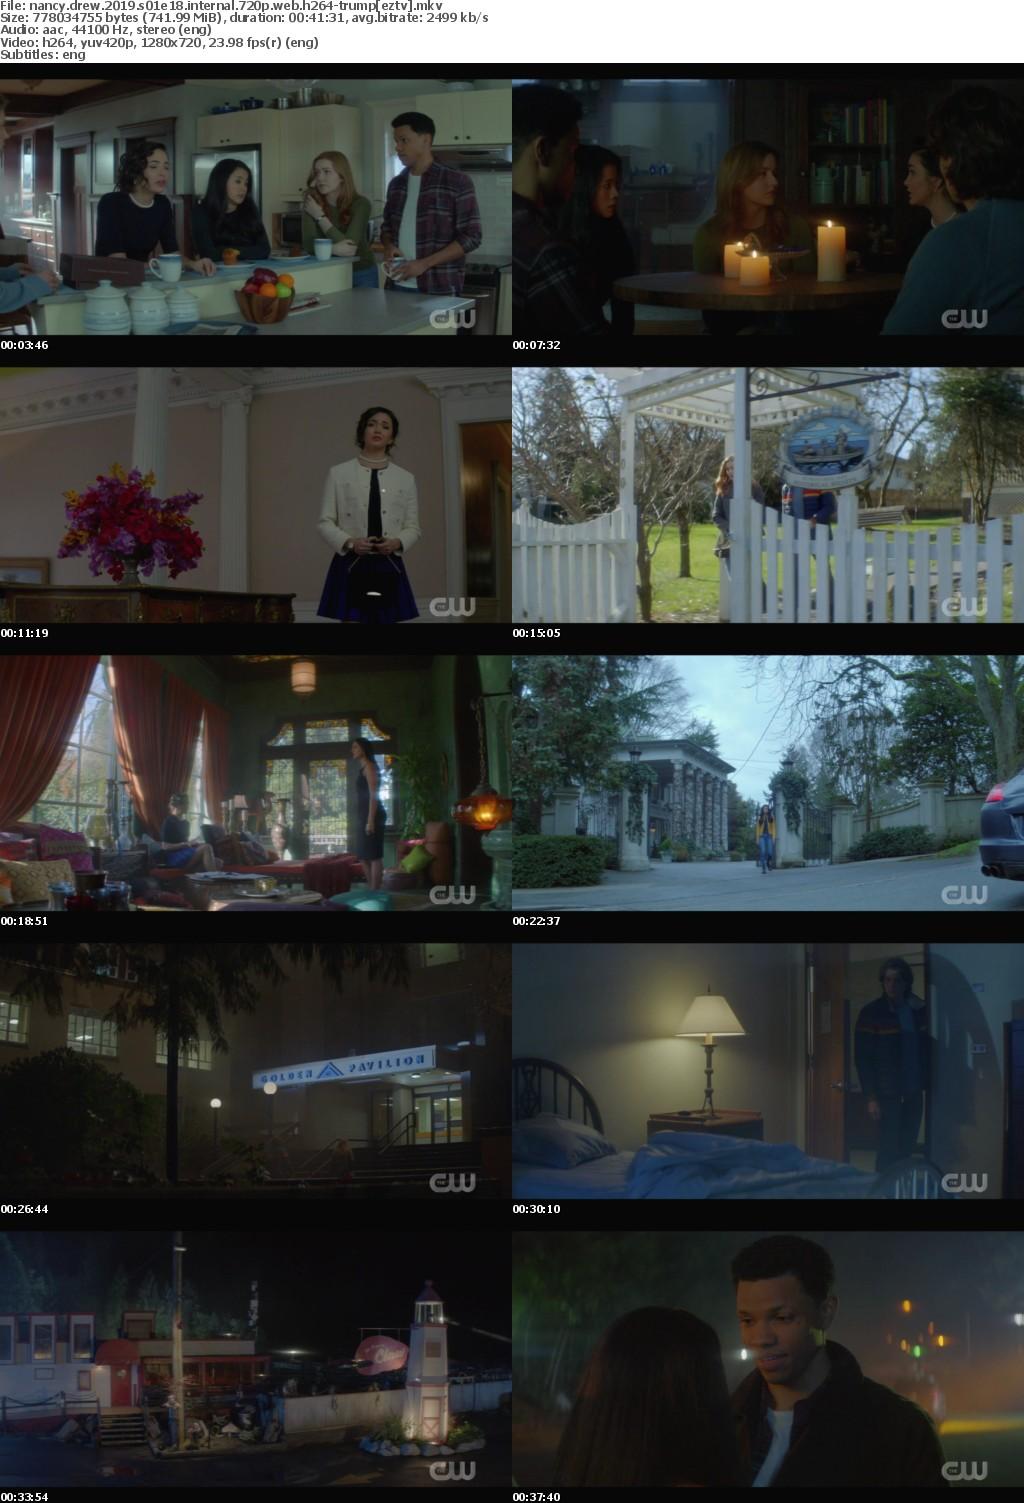 Nancy Drew 2019 S01E18 iNTERNAL 720p WEB h264-TRUMP